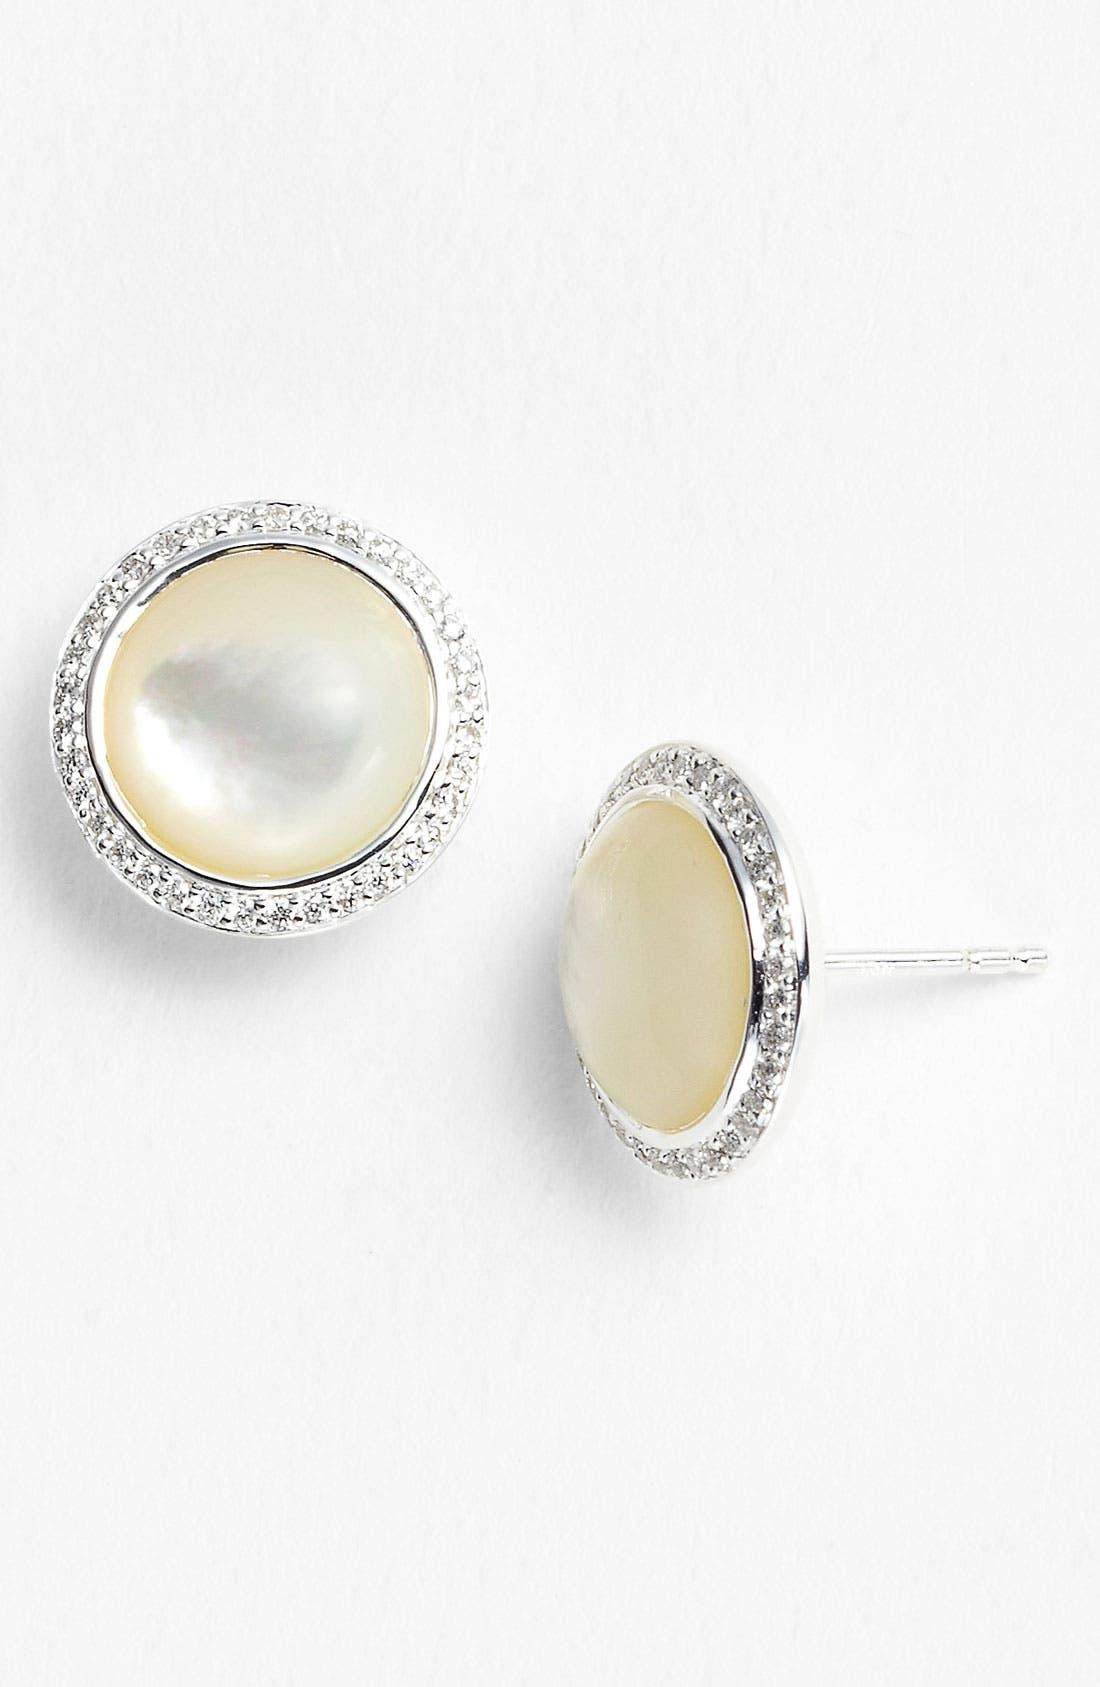 Main Image - Ippolita 'Scultura' Diamond & Cabochon Stud Earrings